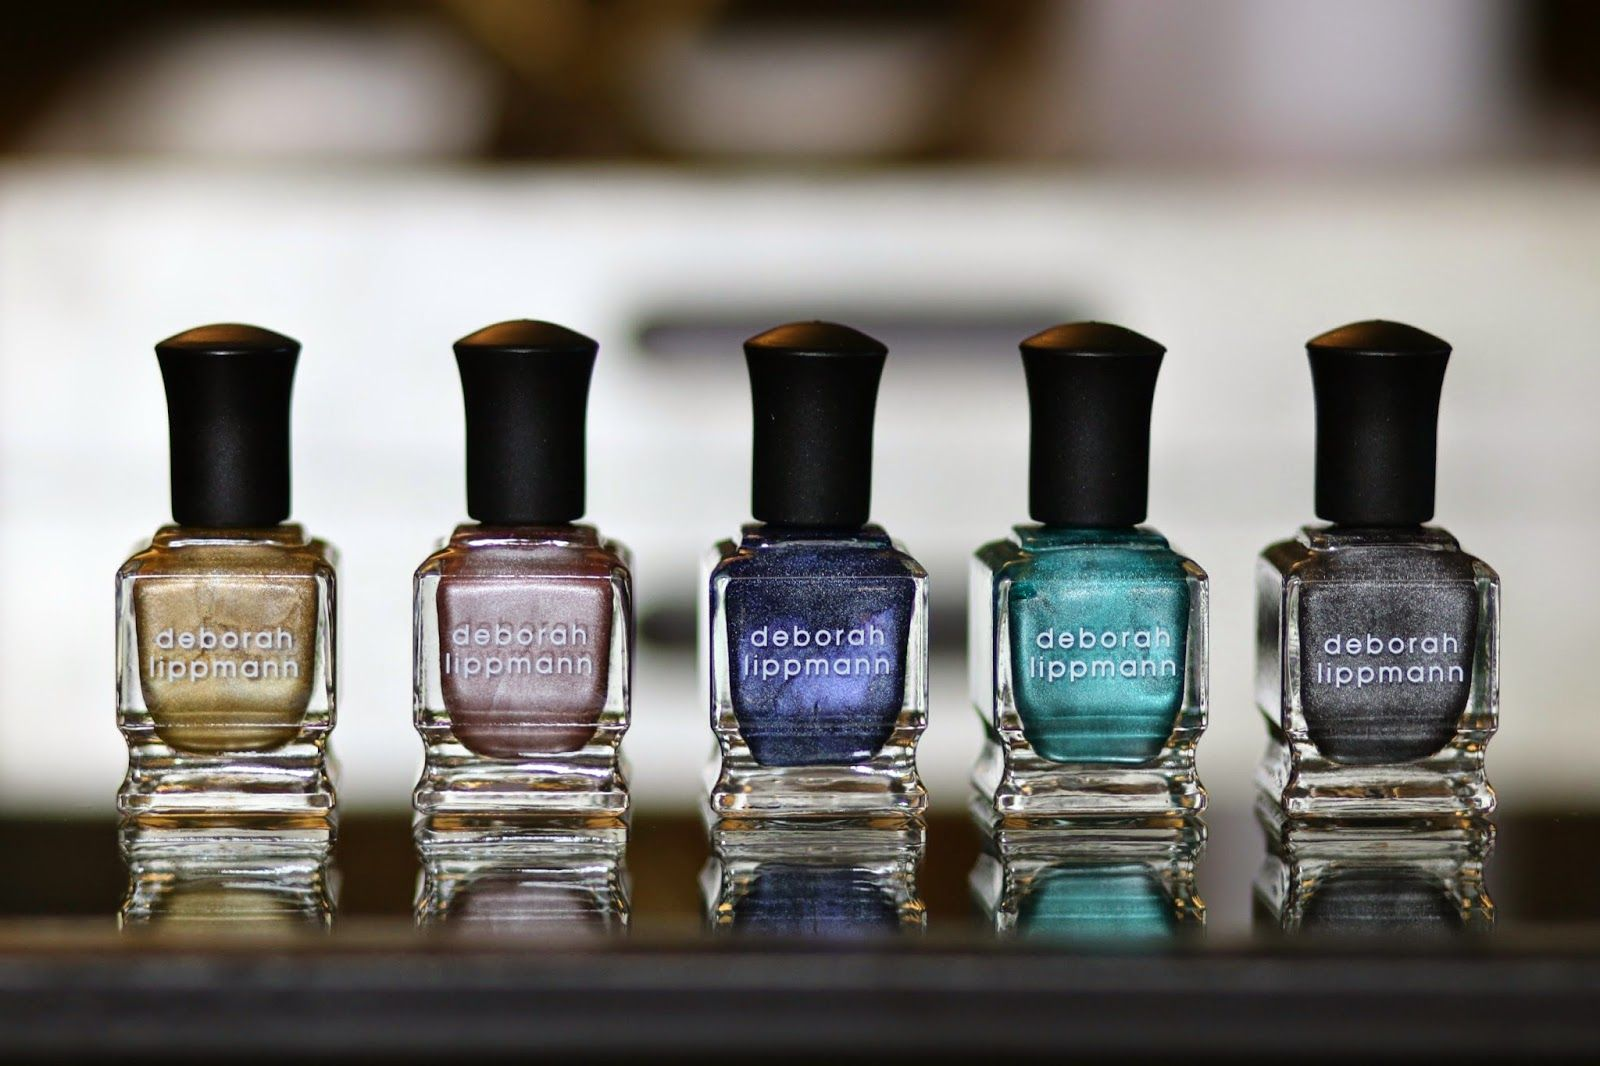 Deborah Lippmann New York Marquee Fall 2014 Collection | Makeup ...